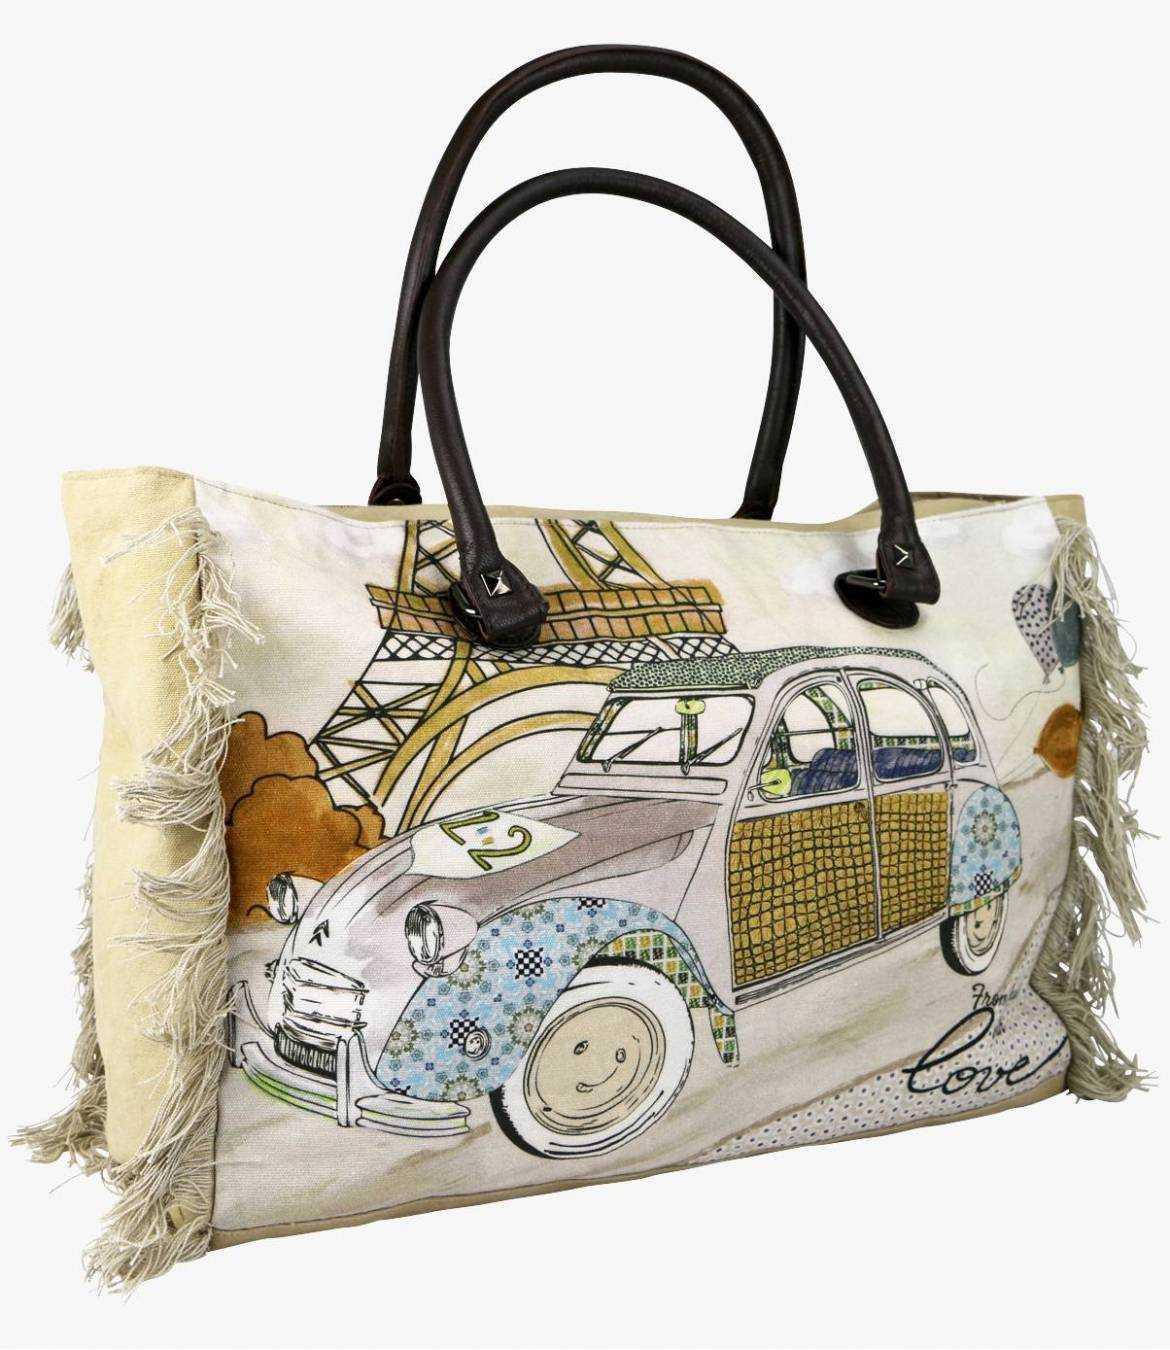 CRUISE - GAMME VOYAGE Women's Cotton Bag 40x30x15 cm Storiatipic - 5